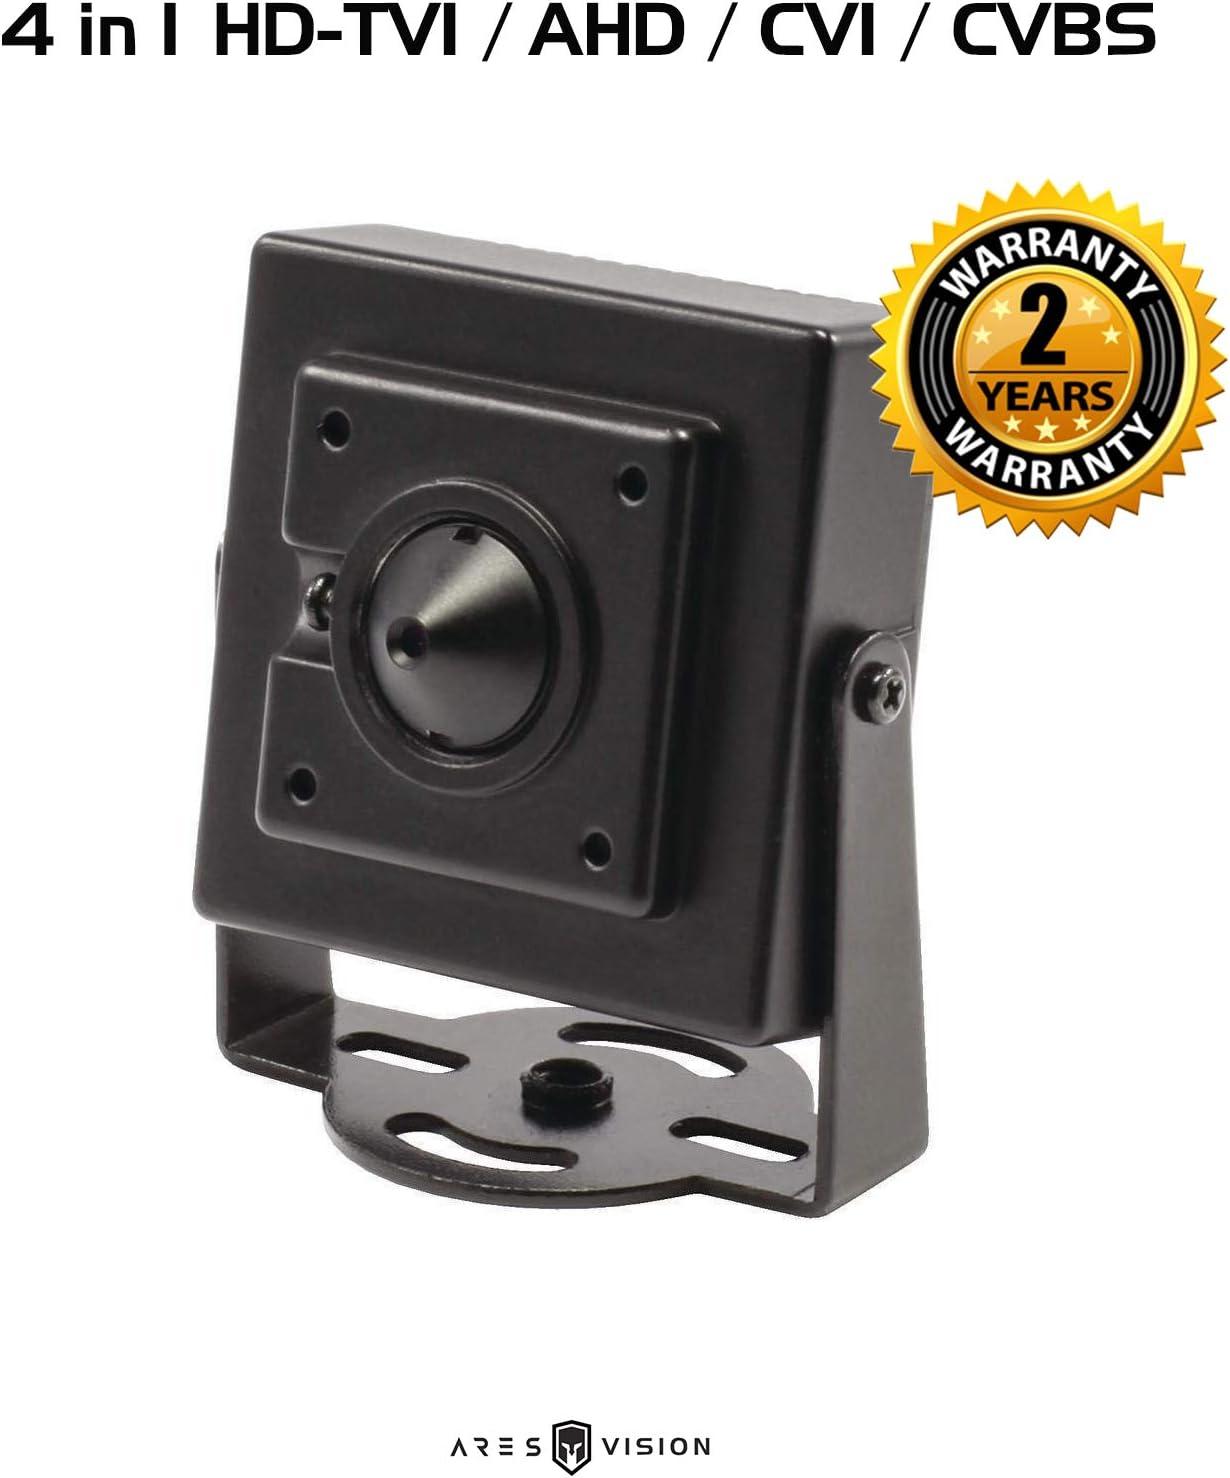 AHD Analog Spy Pinhole  5.0MP 1080p HD  3.7mm  Camera CCTV HD-TVI,CVI